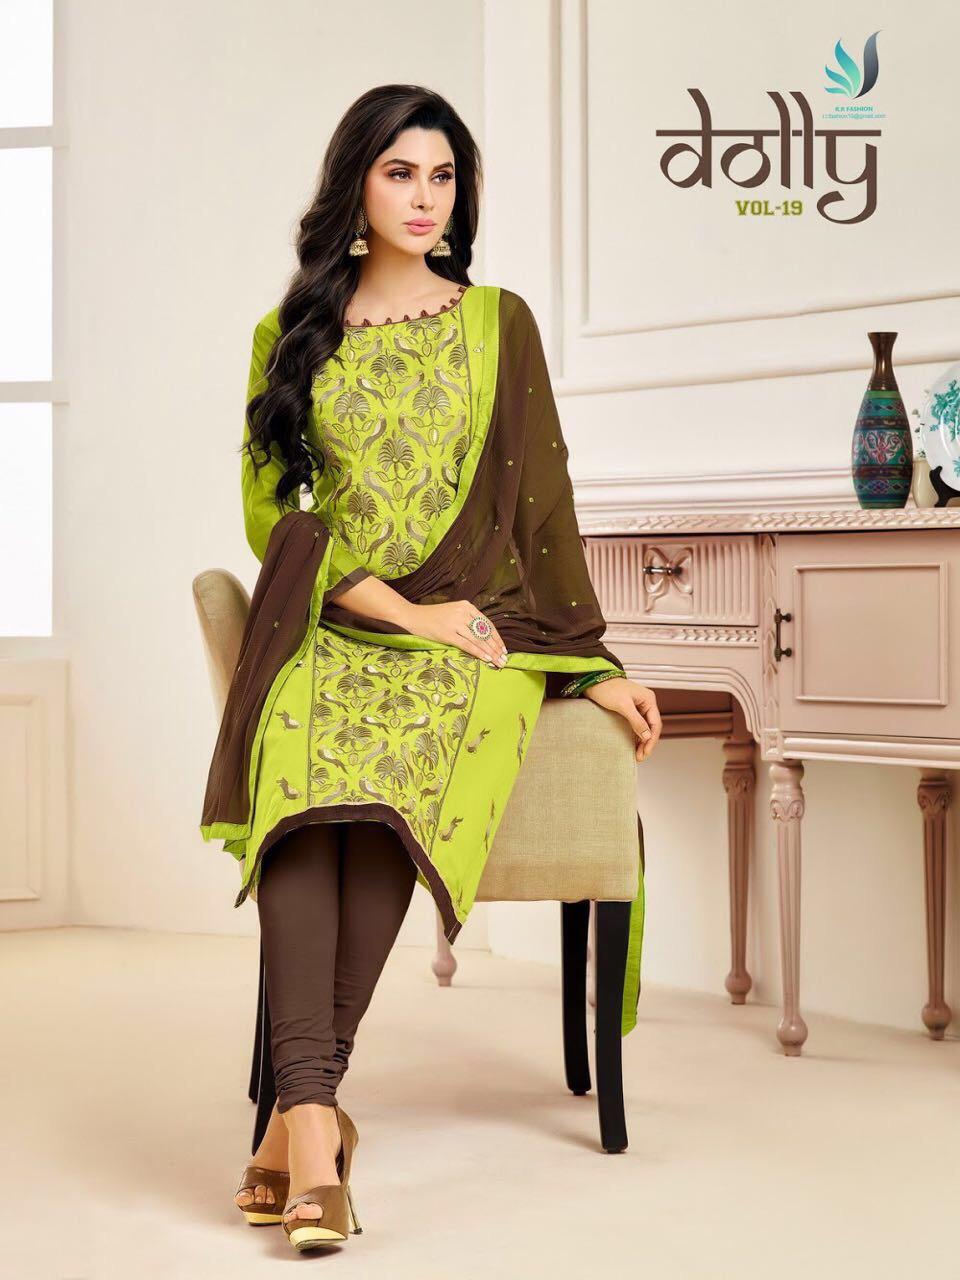 Rr Fashion Presents Dolly Vol 19 Cotton Dupatta Work Wholesale Price - 531/-